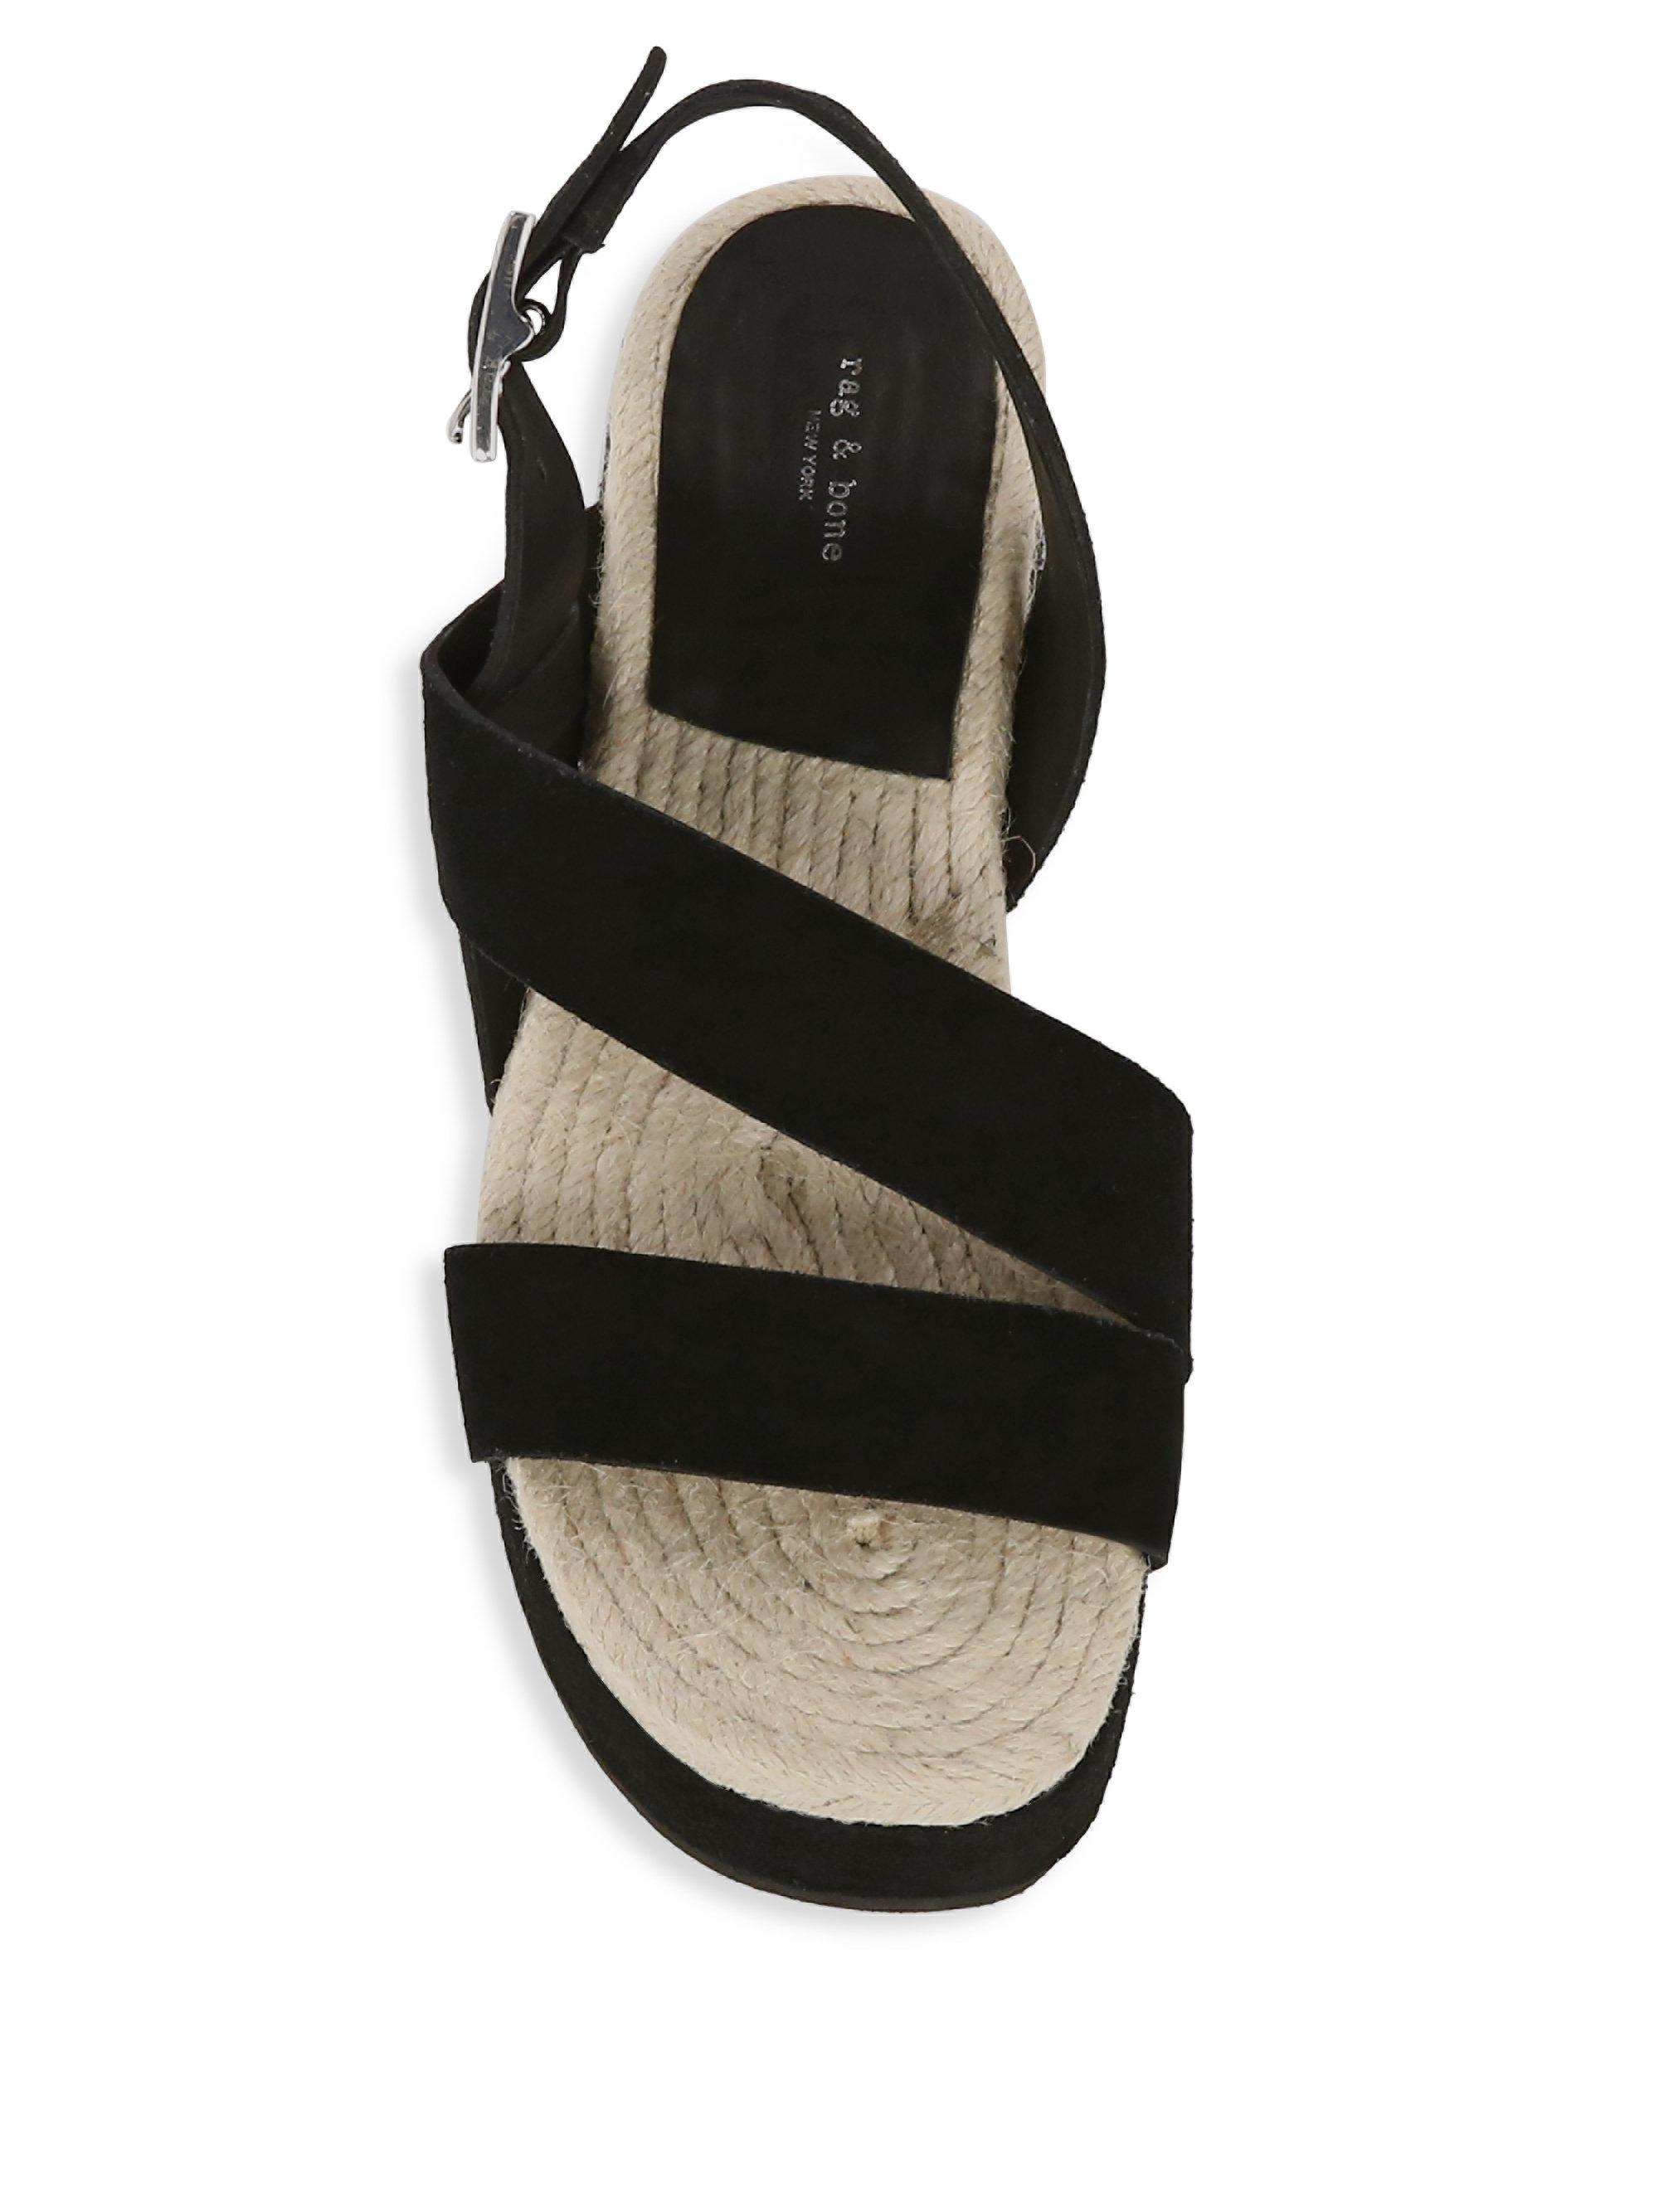 e850dab5f78 Rag   Bone - Black Megan Suede Wedge Sandals - Lyst. View fullscreen